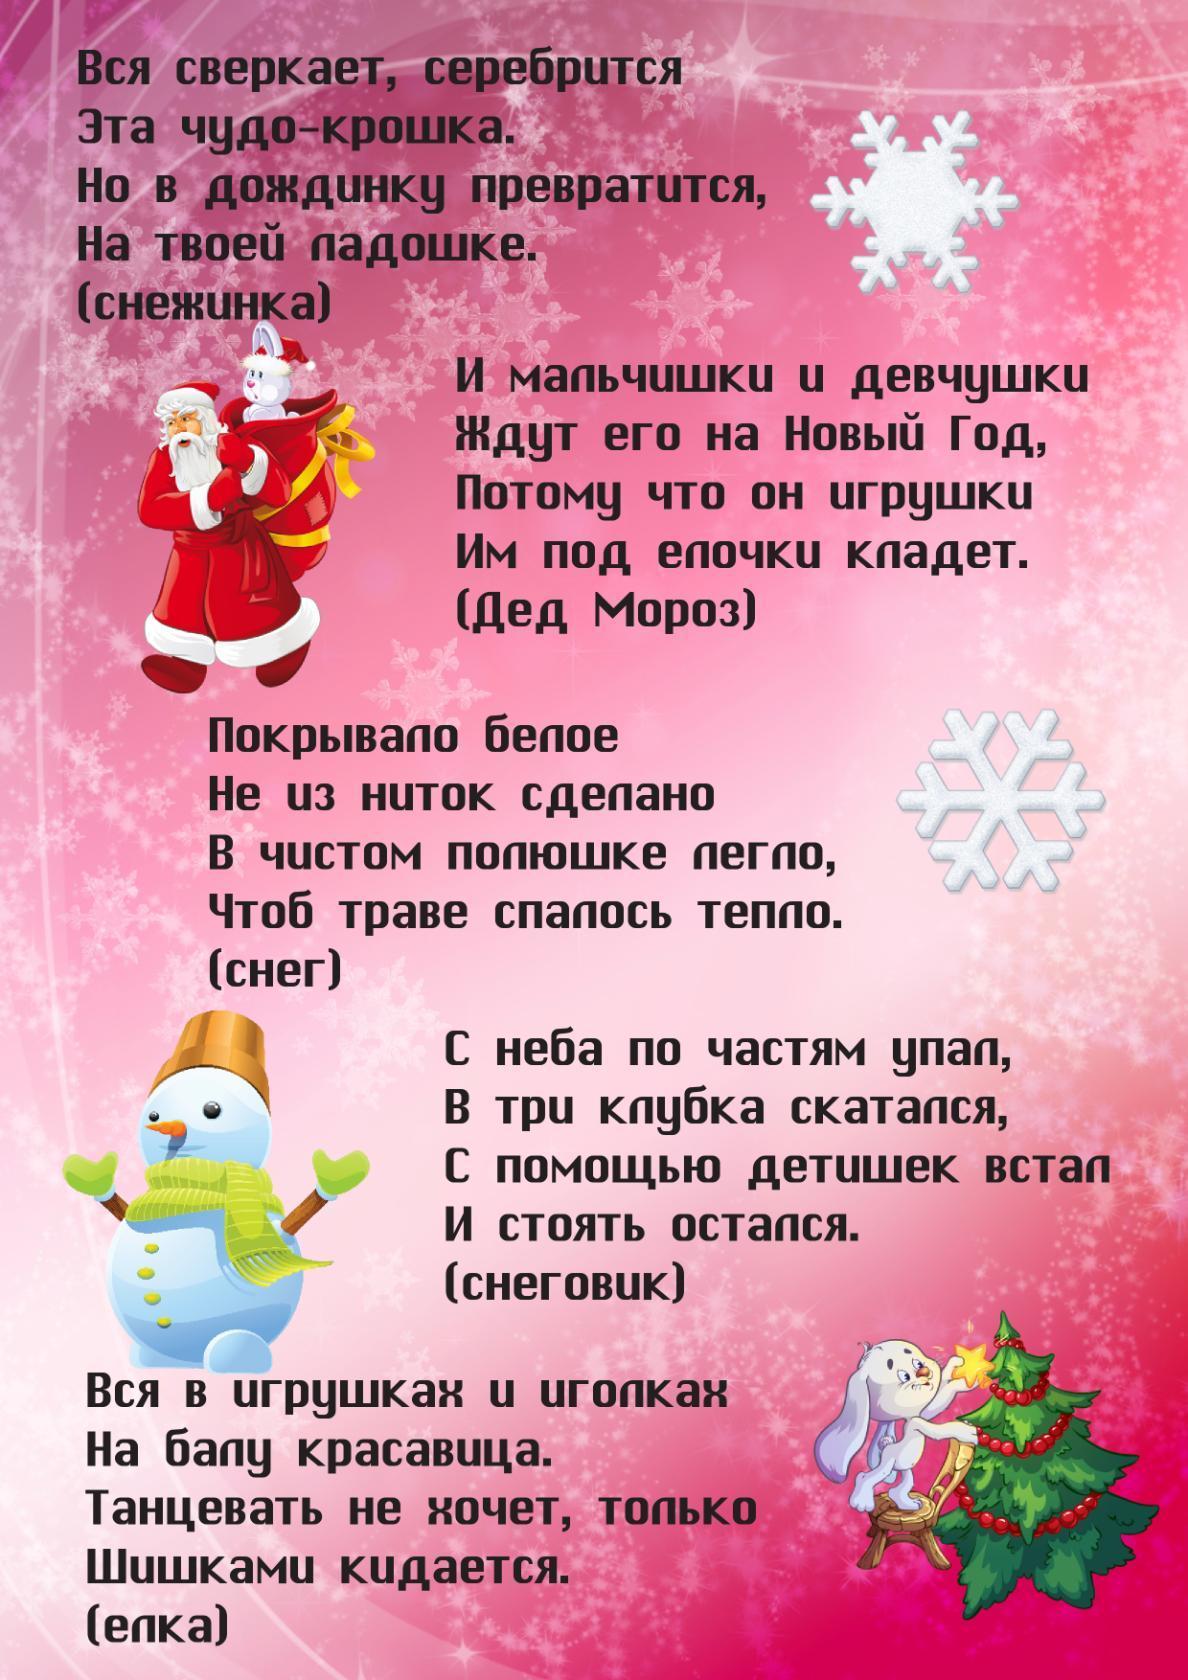 http://s2.uploads.ru/4I6Ur.jpg